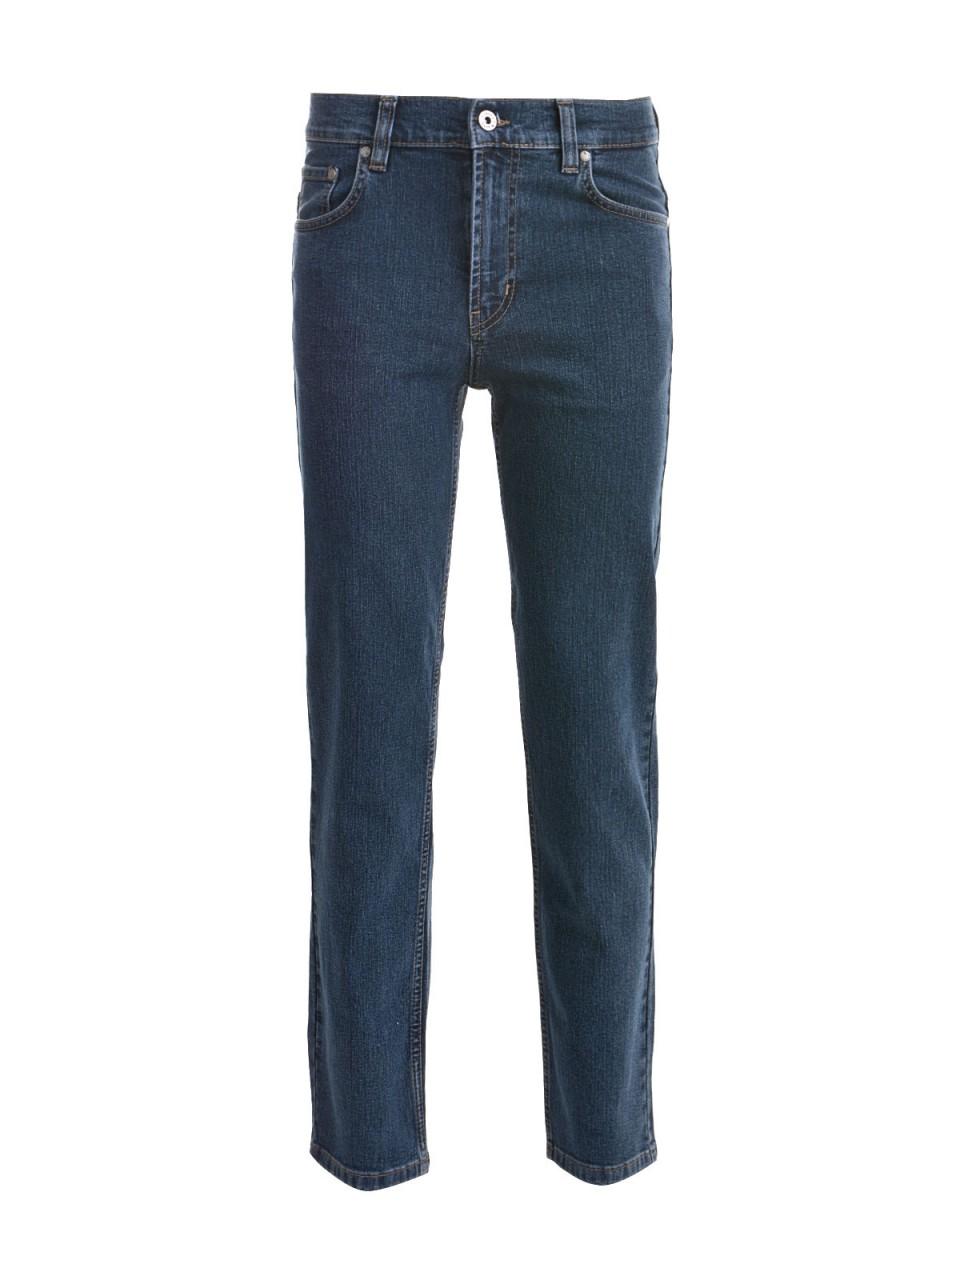 milano-italy-herren-jeans-blau